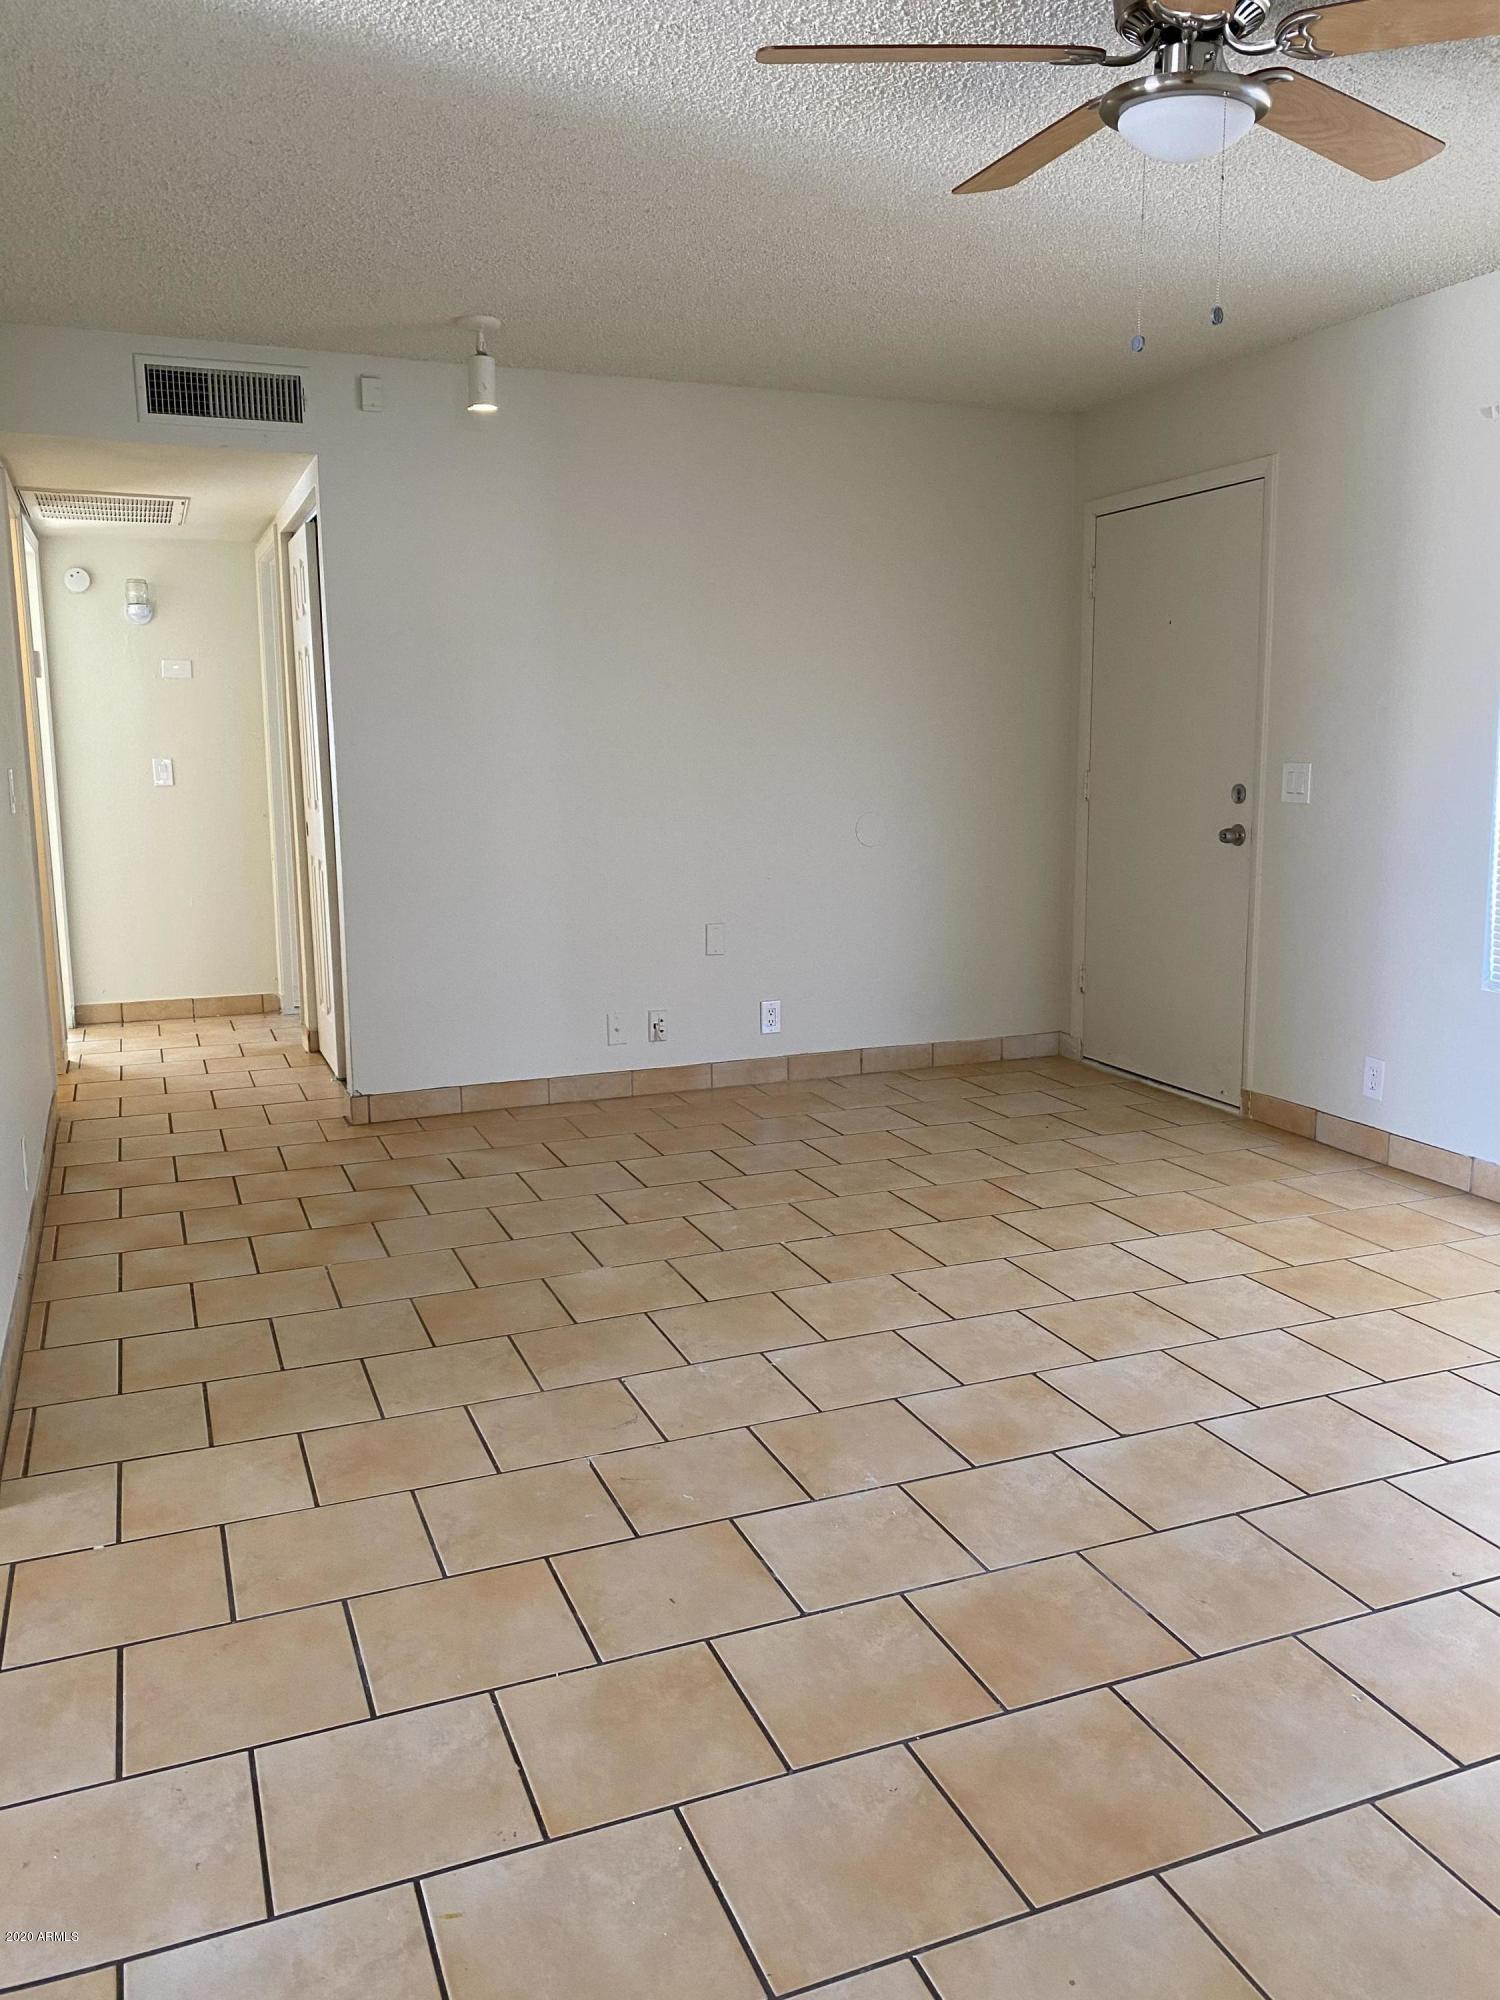 MLS 6100929 Peoria Metro Area, Peoria, AZ 85345 Peoria Homes for Rent